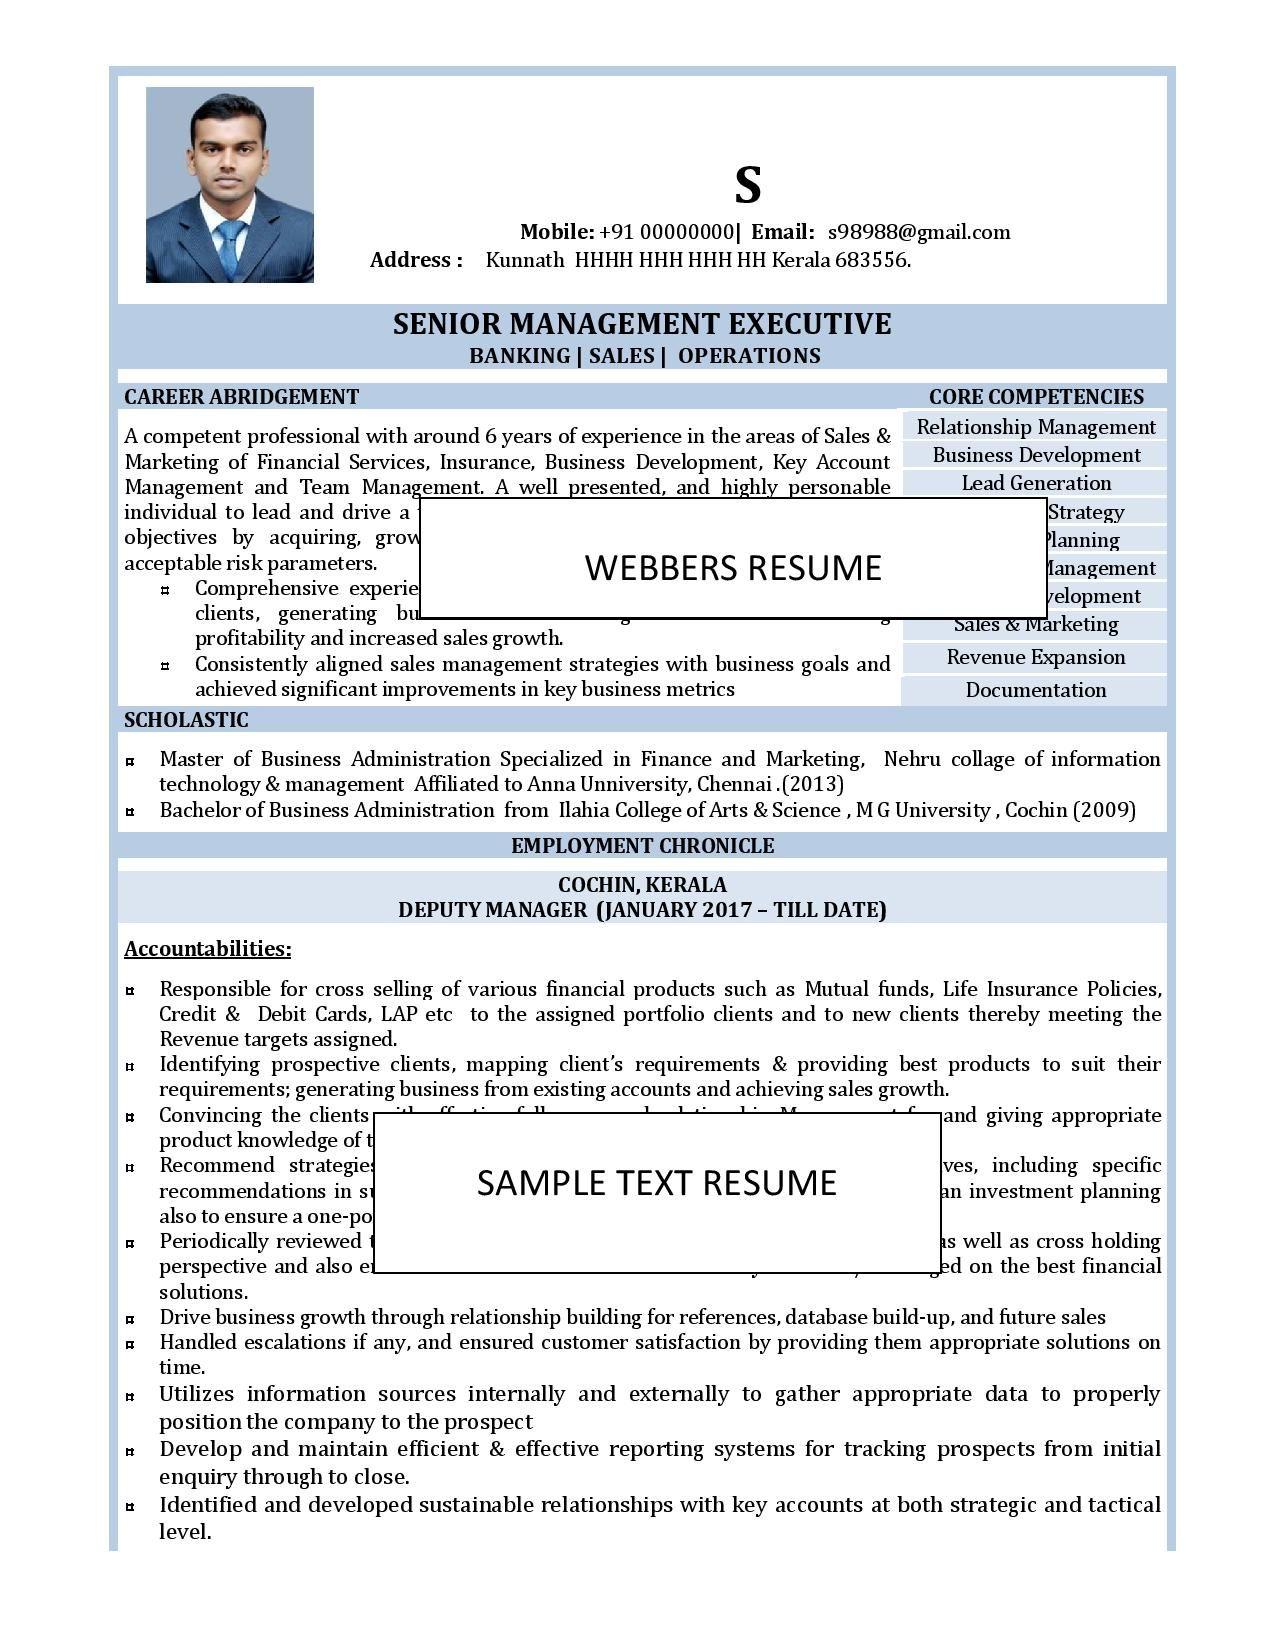 webbers resume tex resum 2t relationship management editable format free download military nurse activities in sample